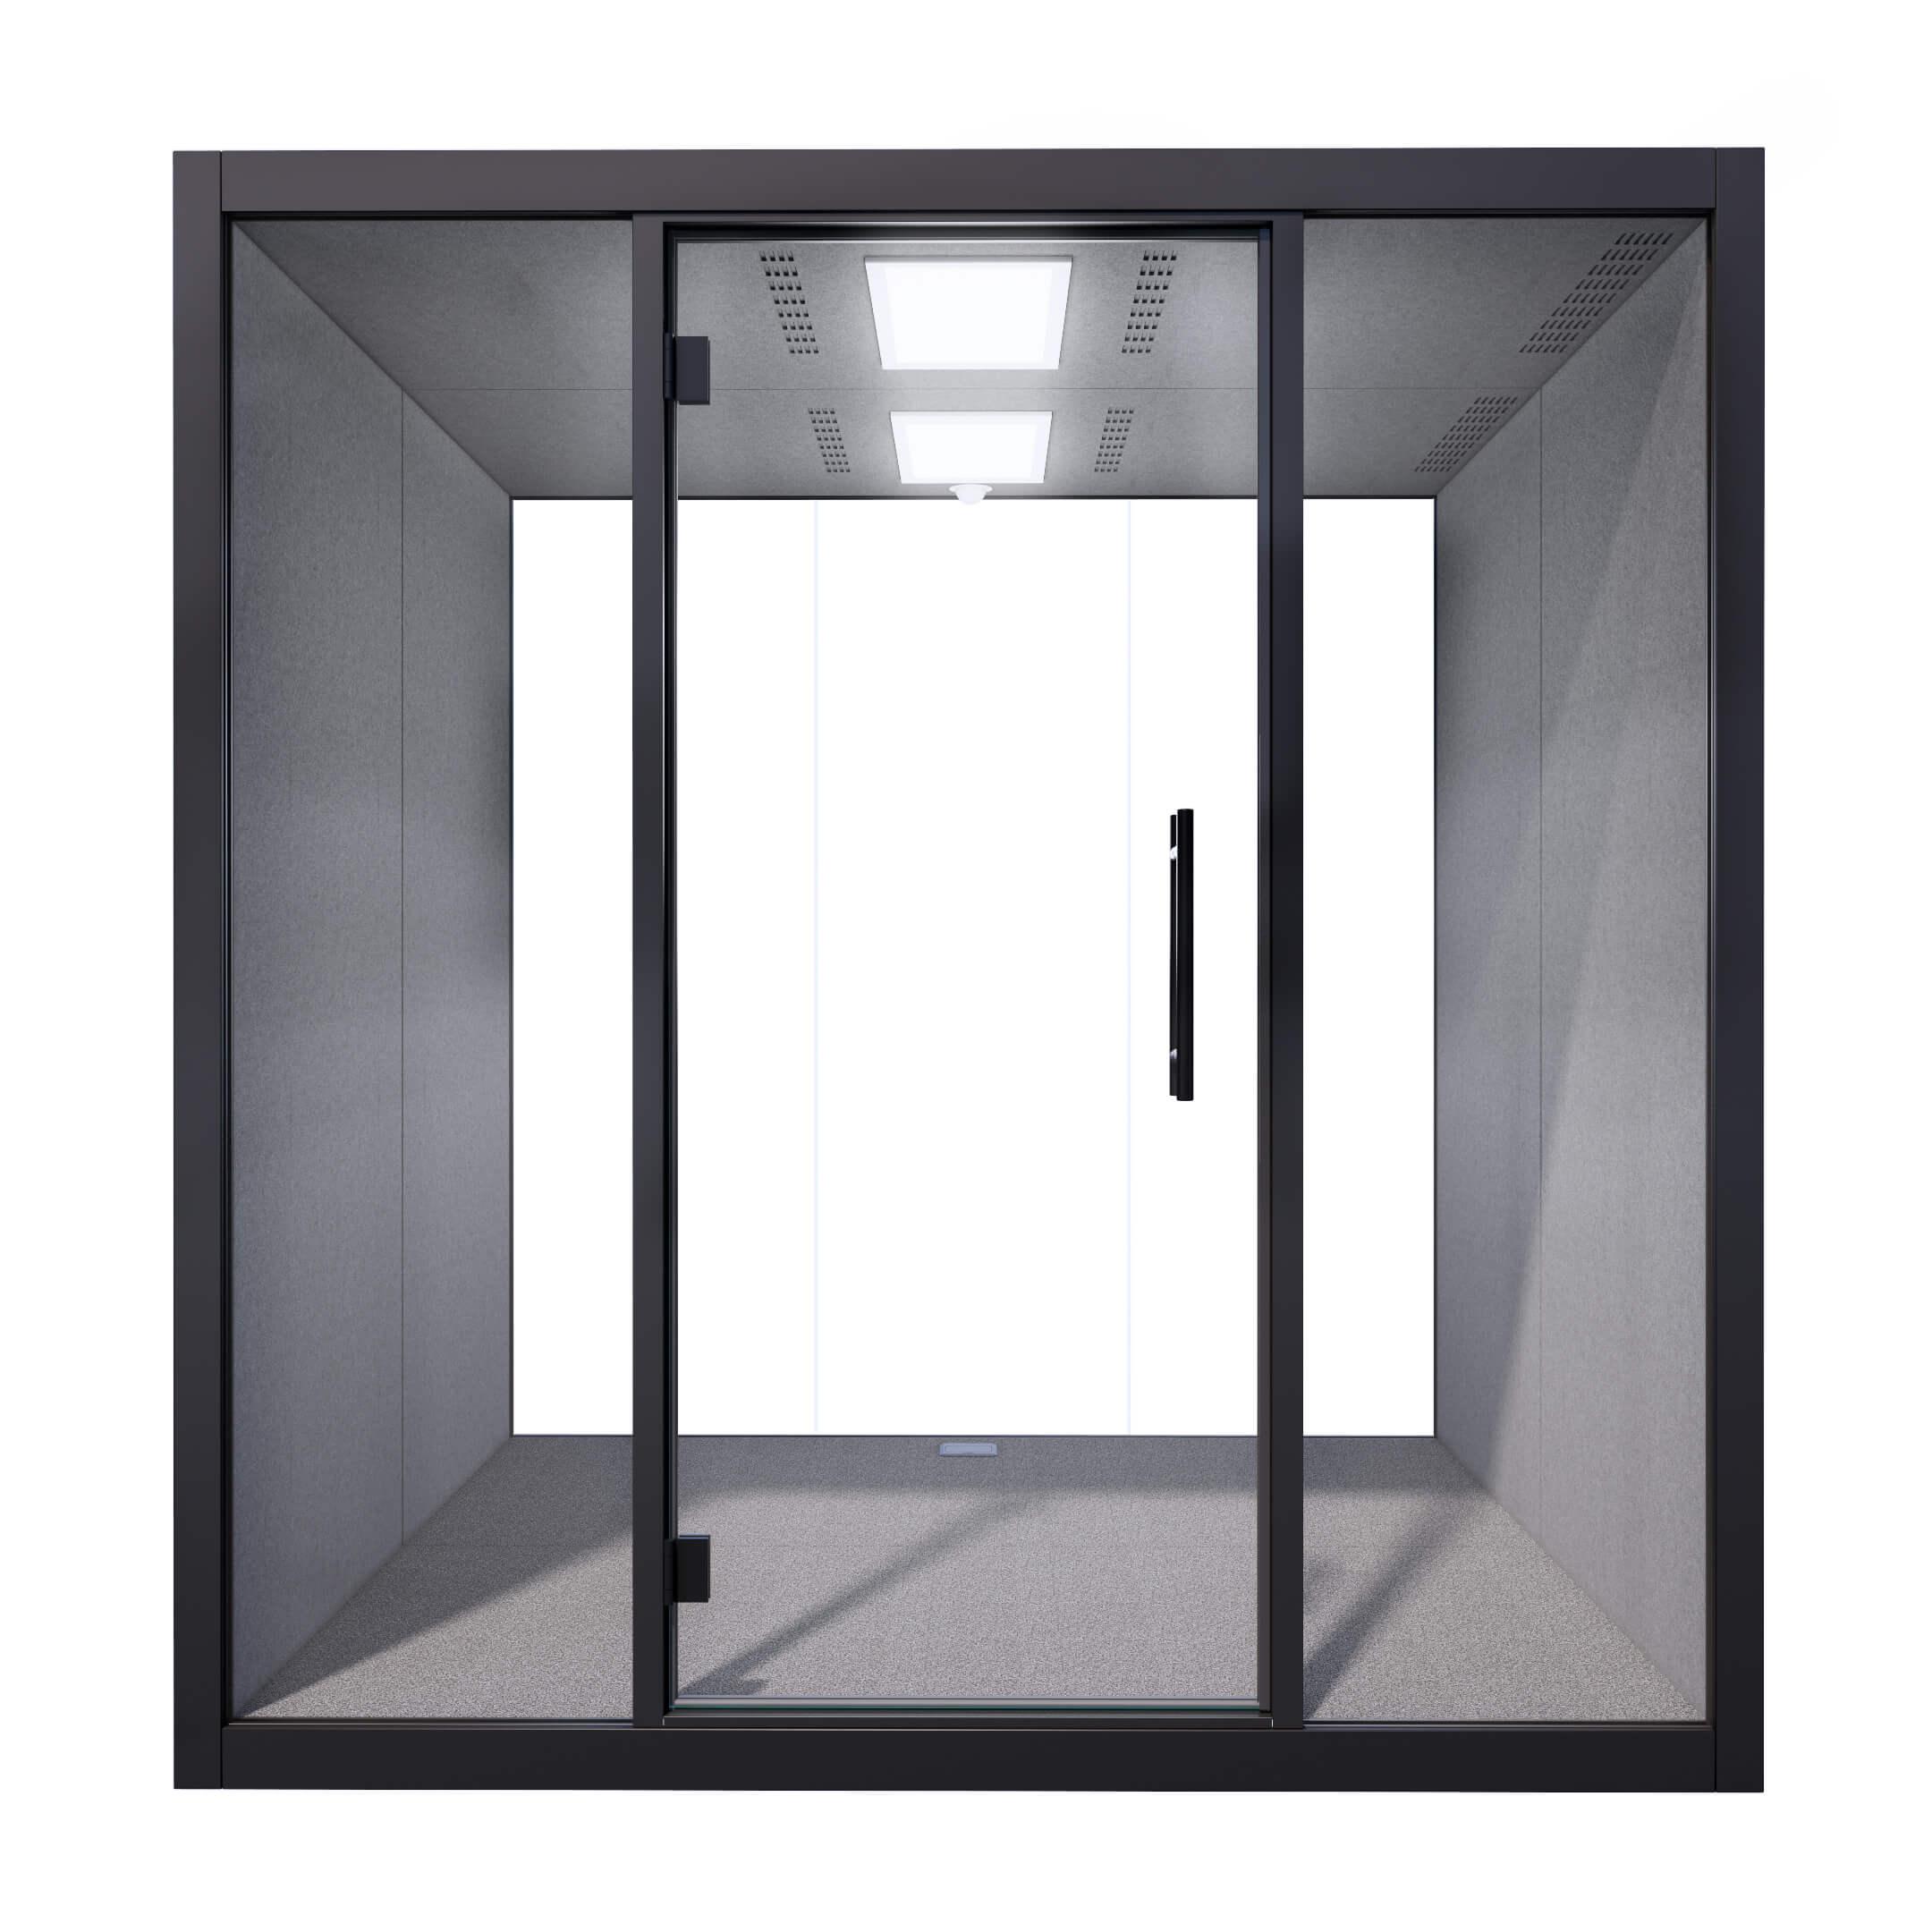 CHATBOX QUATTRO-FRONT VIEW